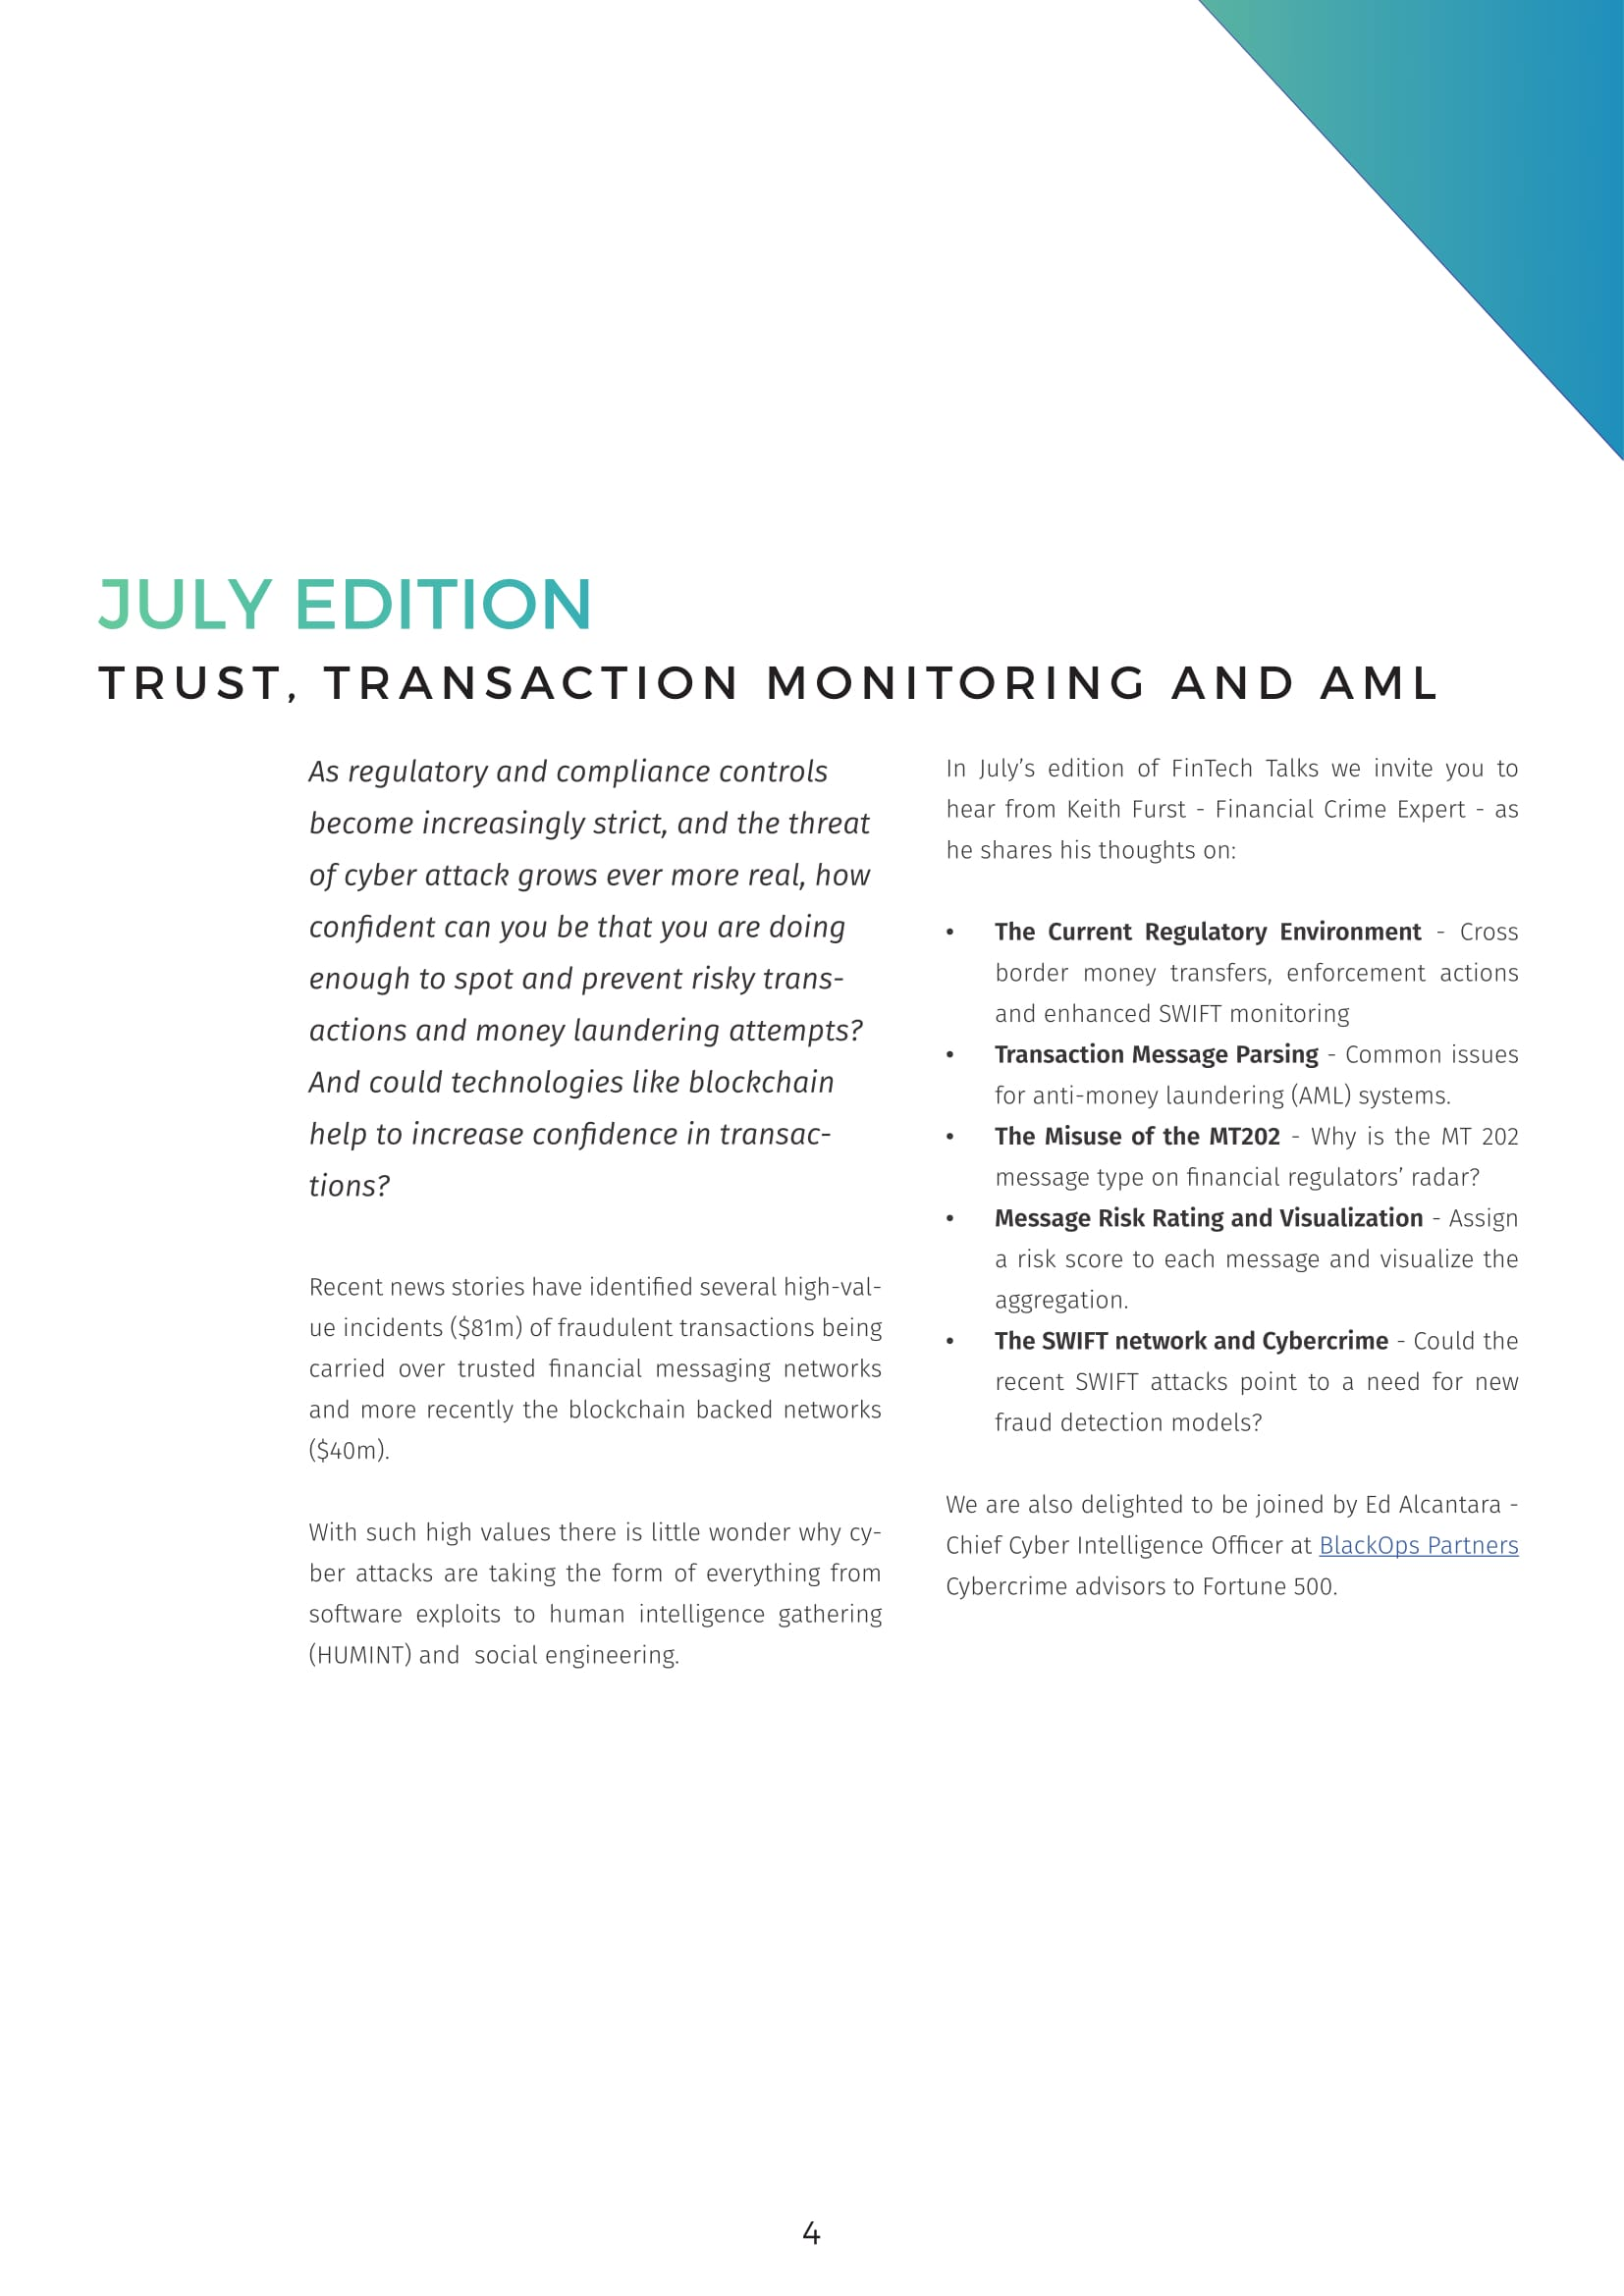 C24_FinTech_Talks_-_July_Edition-4.jpg